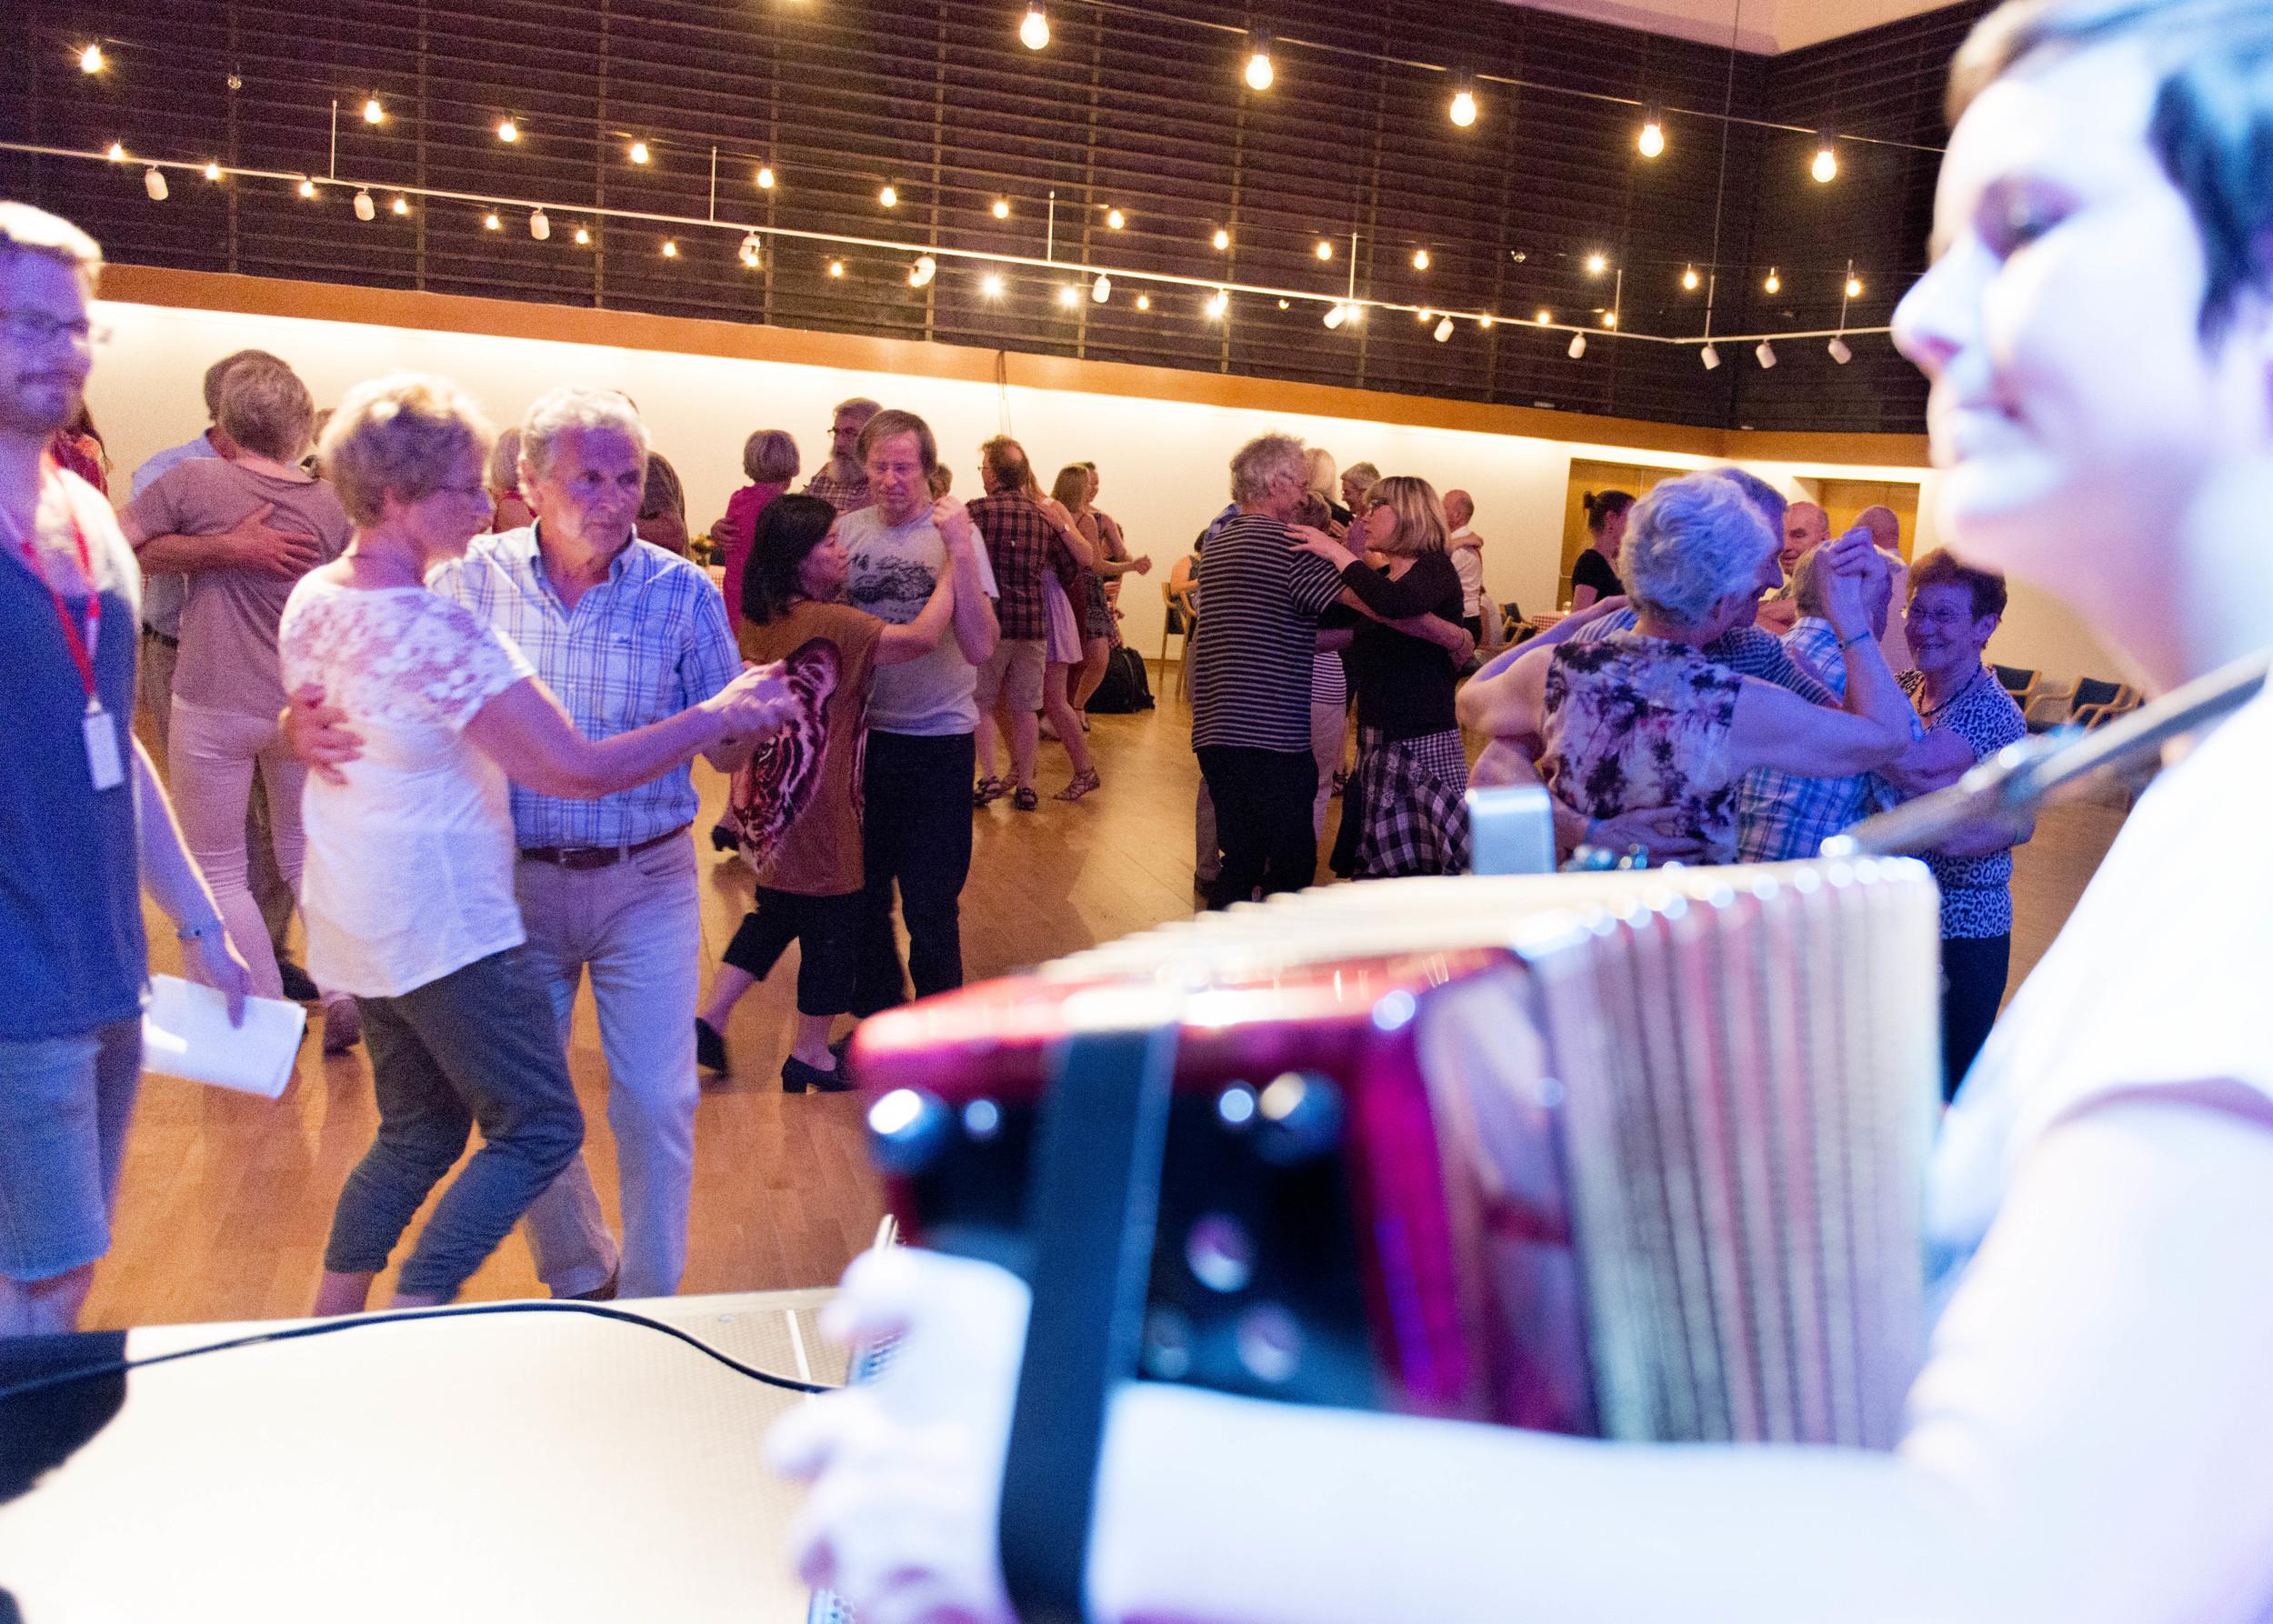 Dansen går_Arve Ullebø_ARU6811 (1).jpg